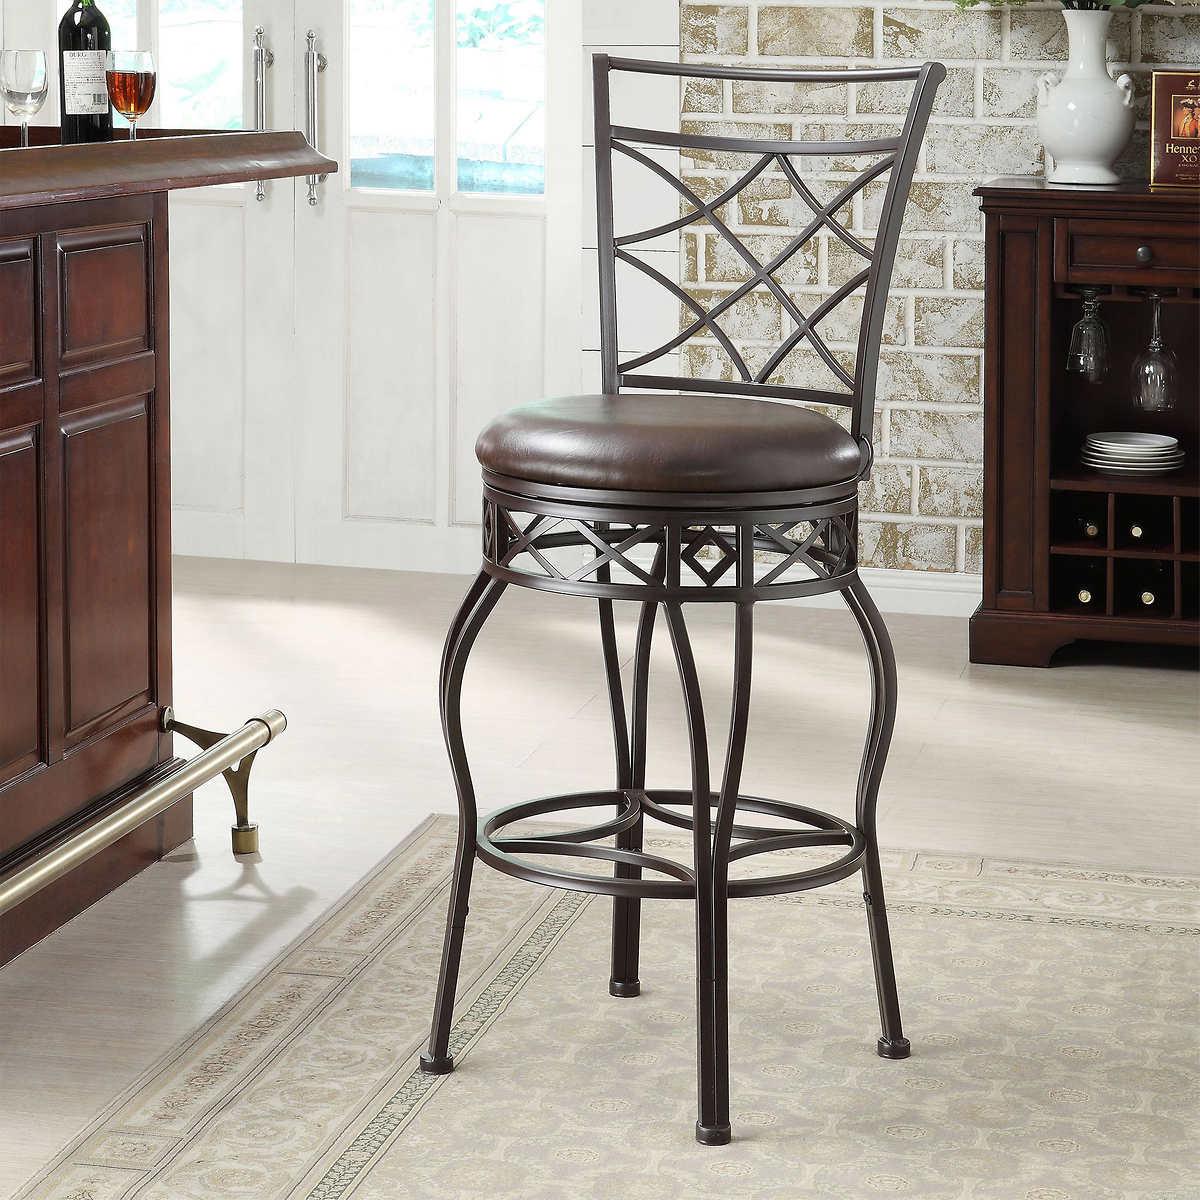 100 bar stools under 30 best 25 bar stools kitchen ideas on